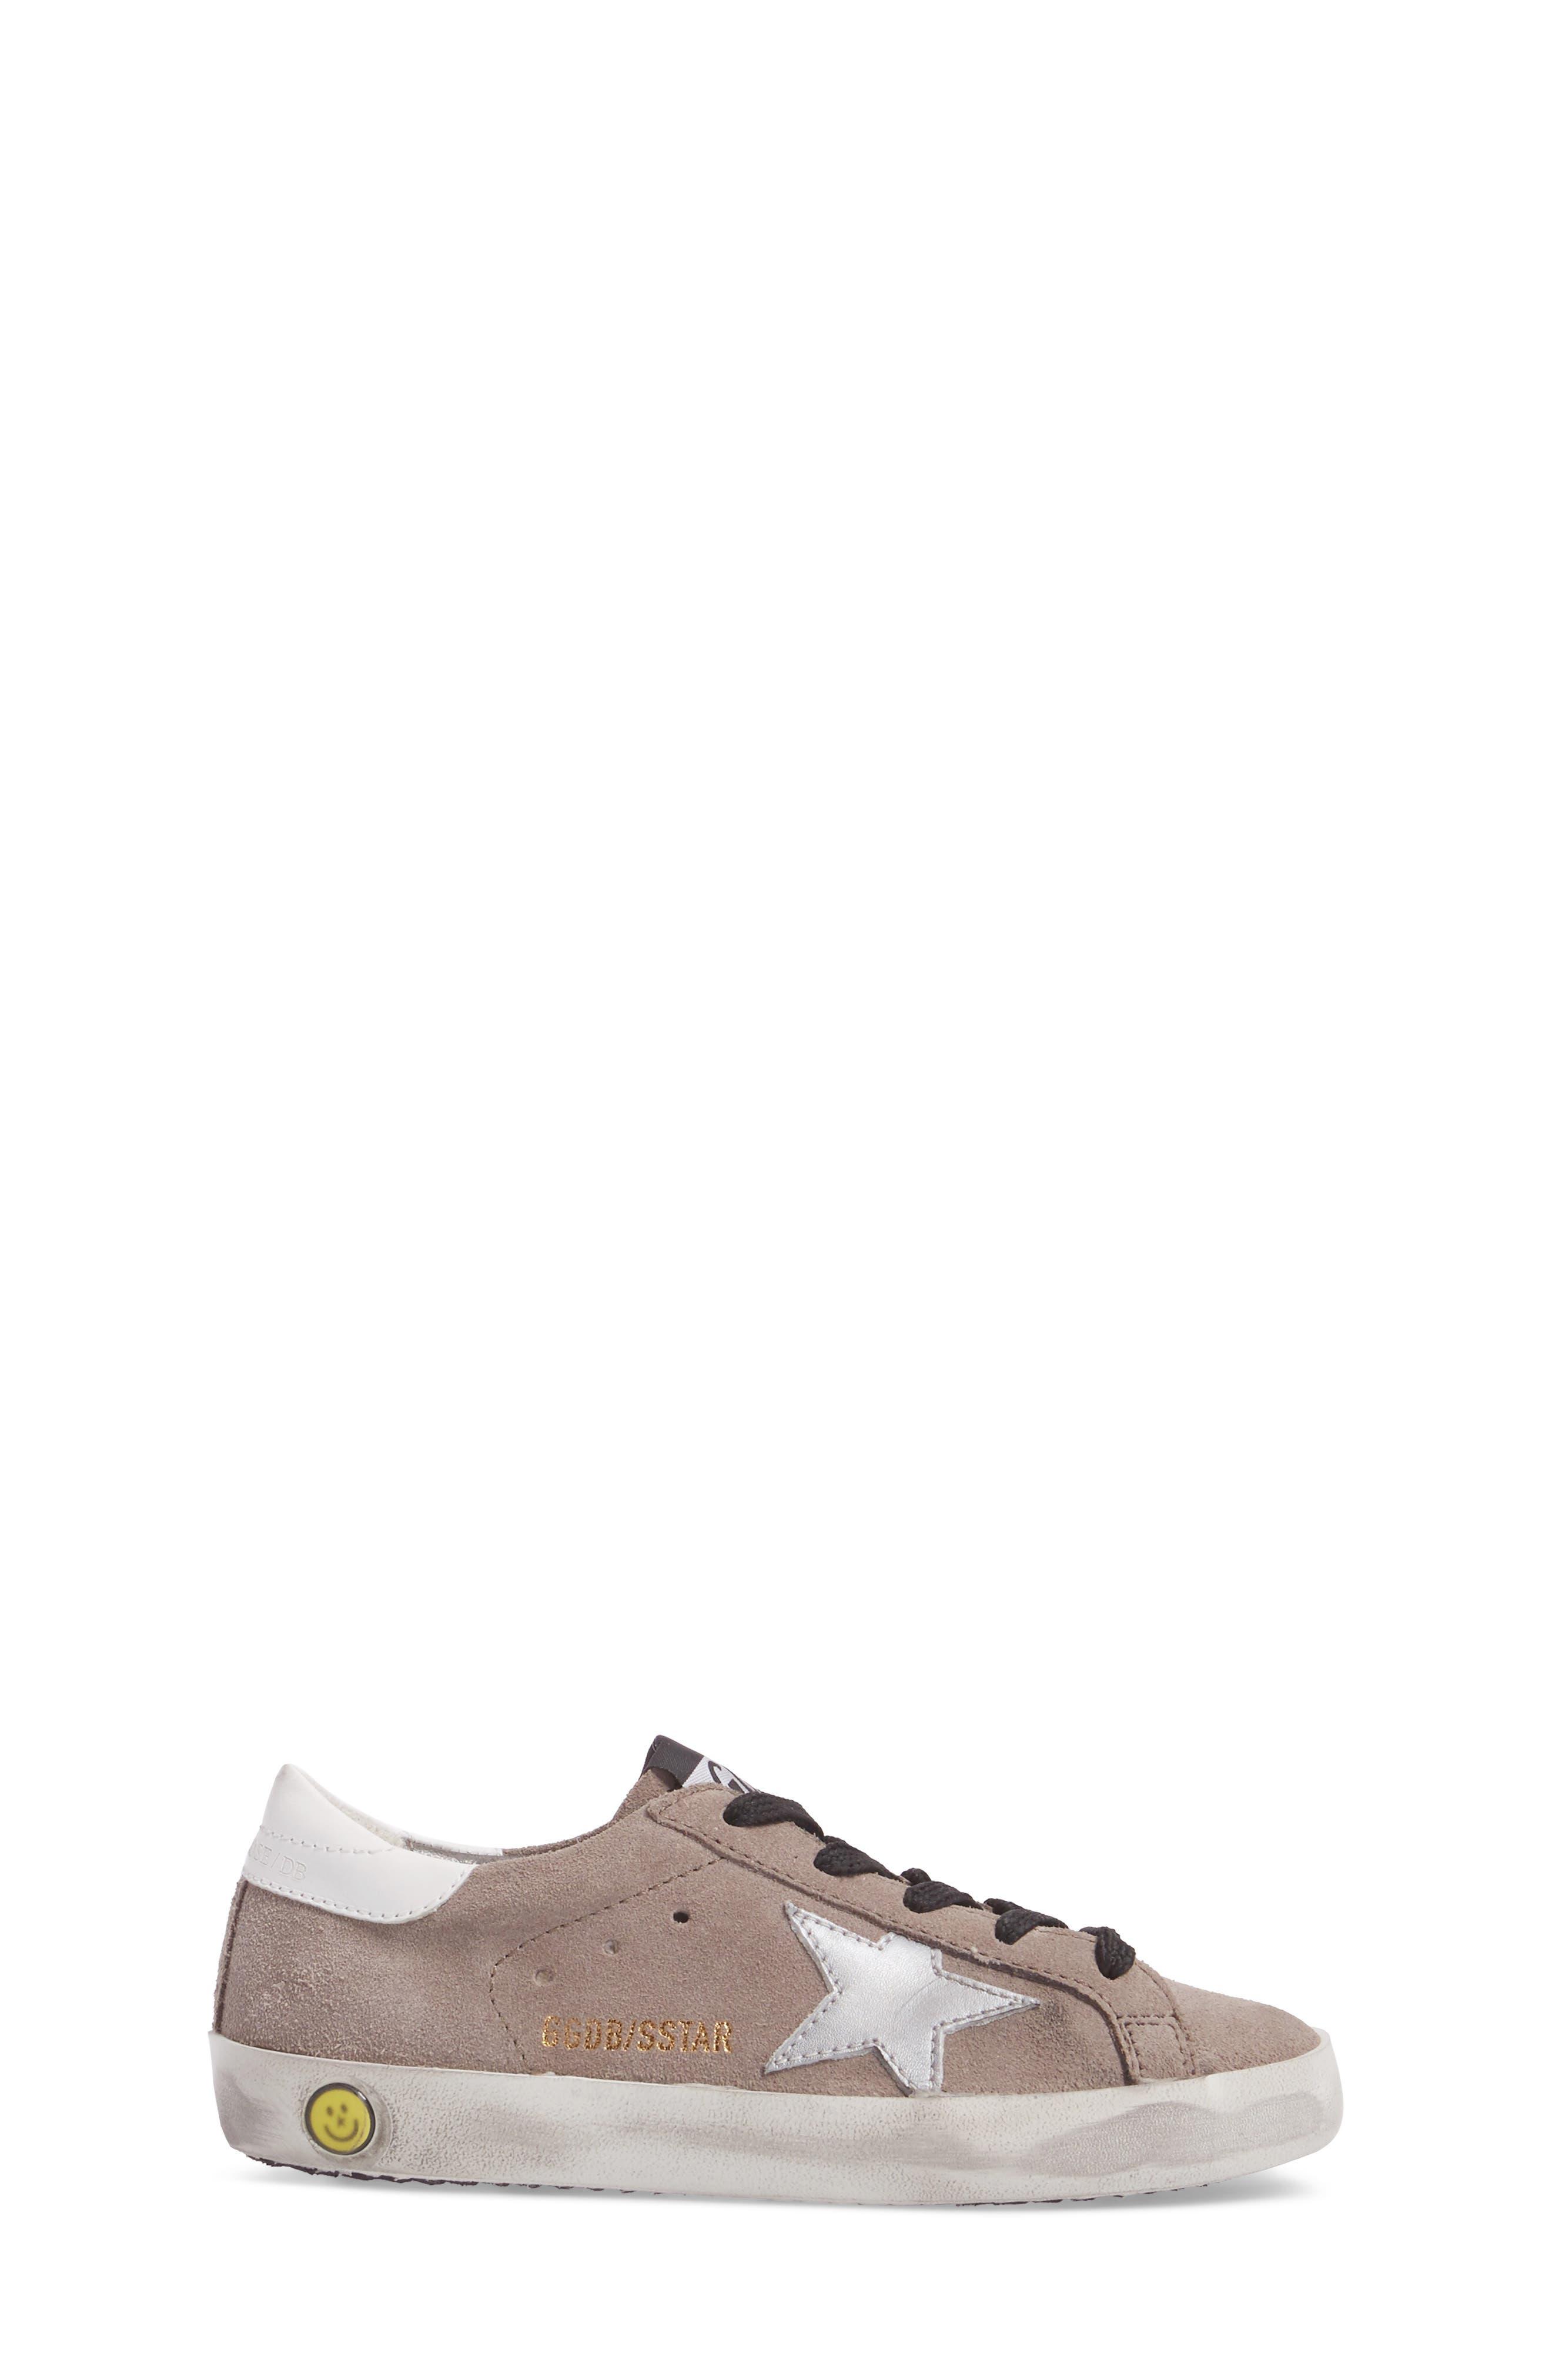 Superstar Low Top Sneaker,                             Alternate thumbnail 3, color,                             030